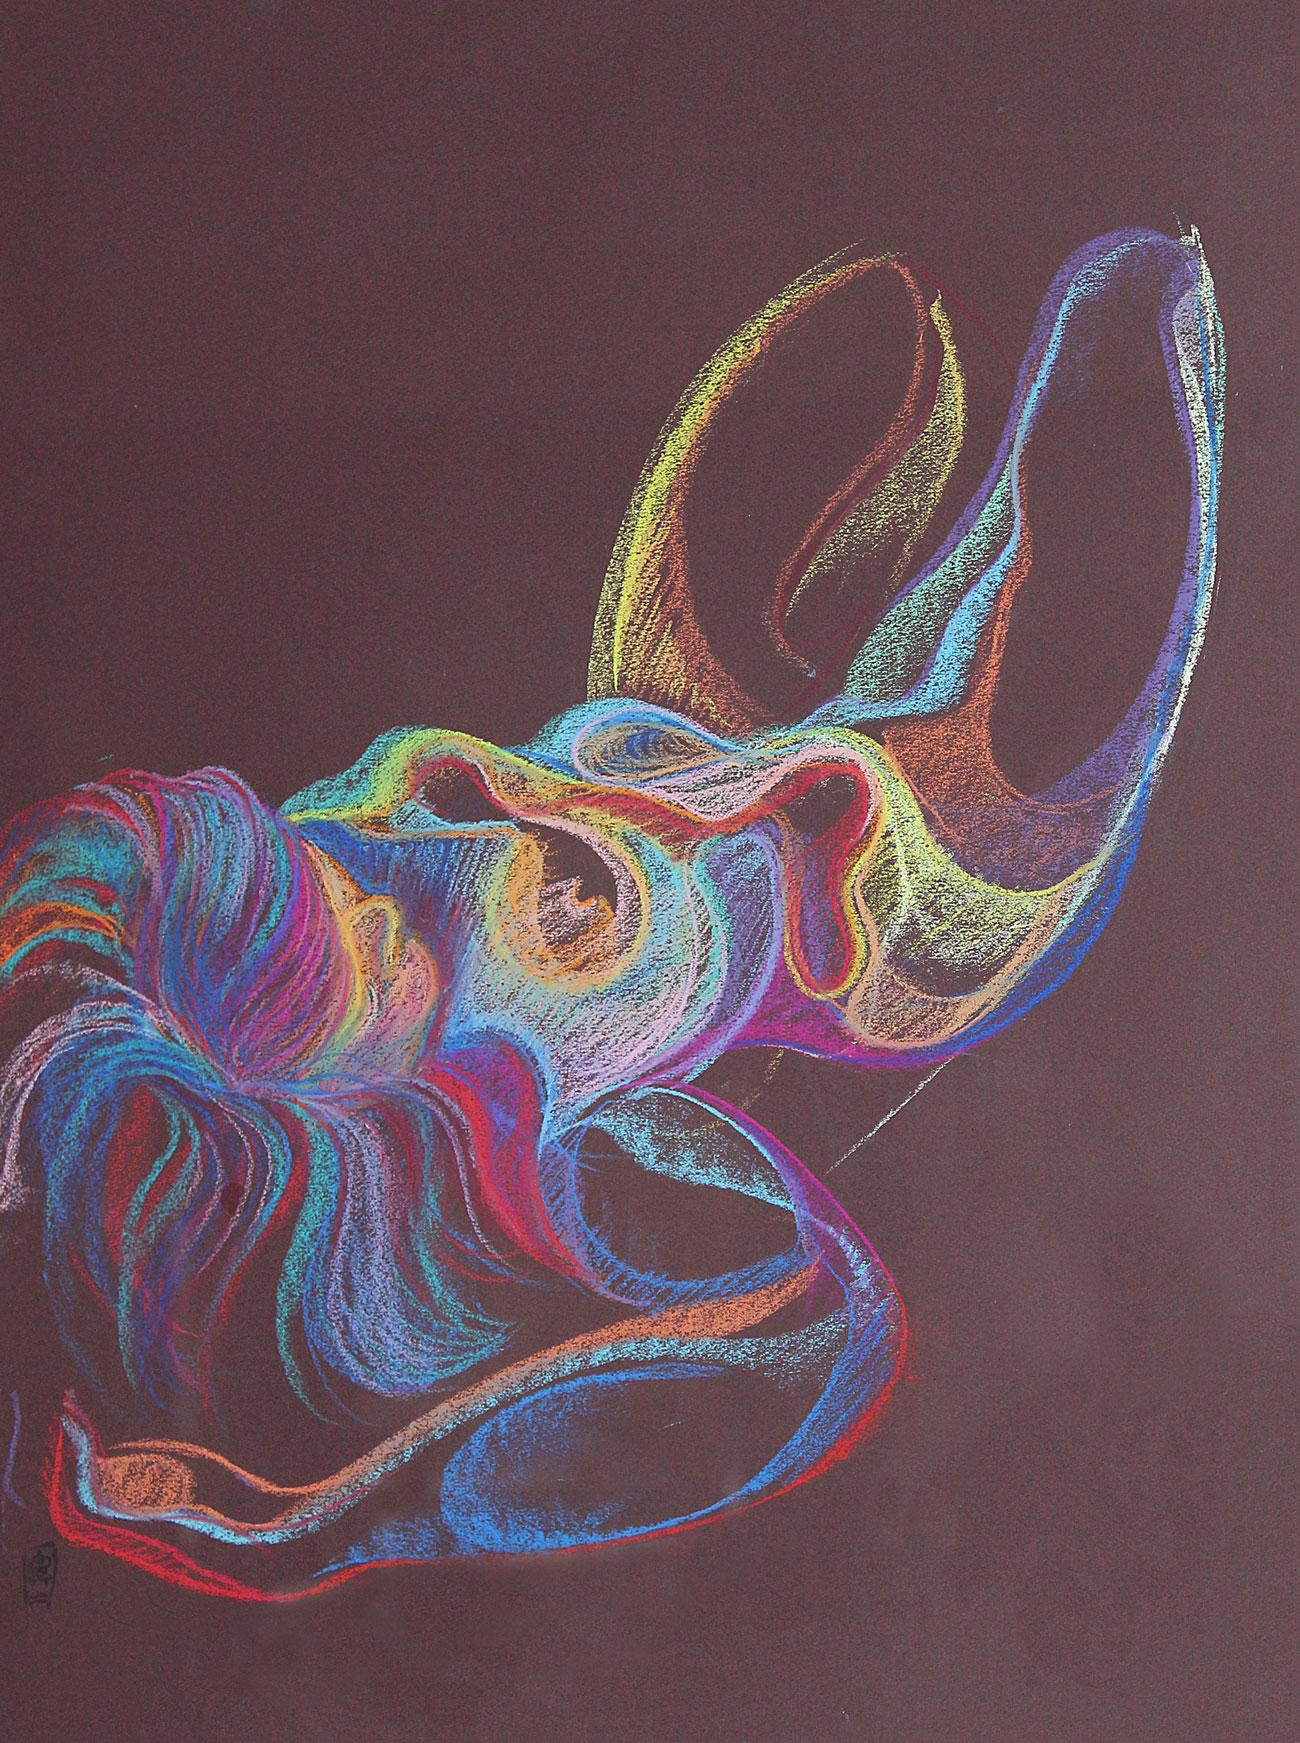 Hairscape-by-Ilia-Chidzey